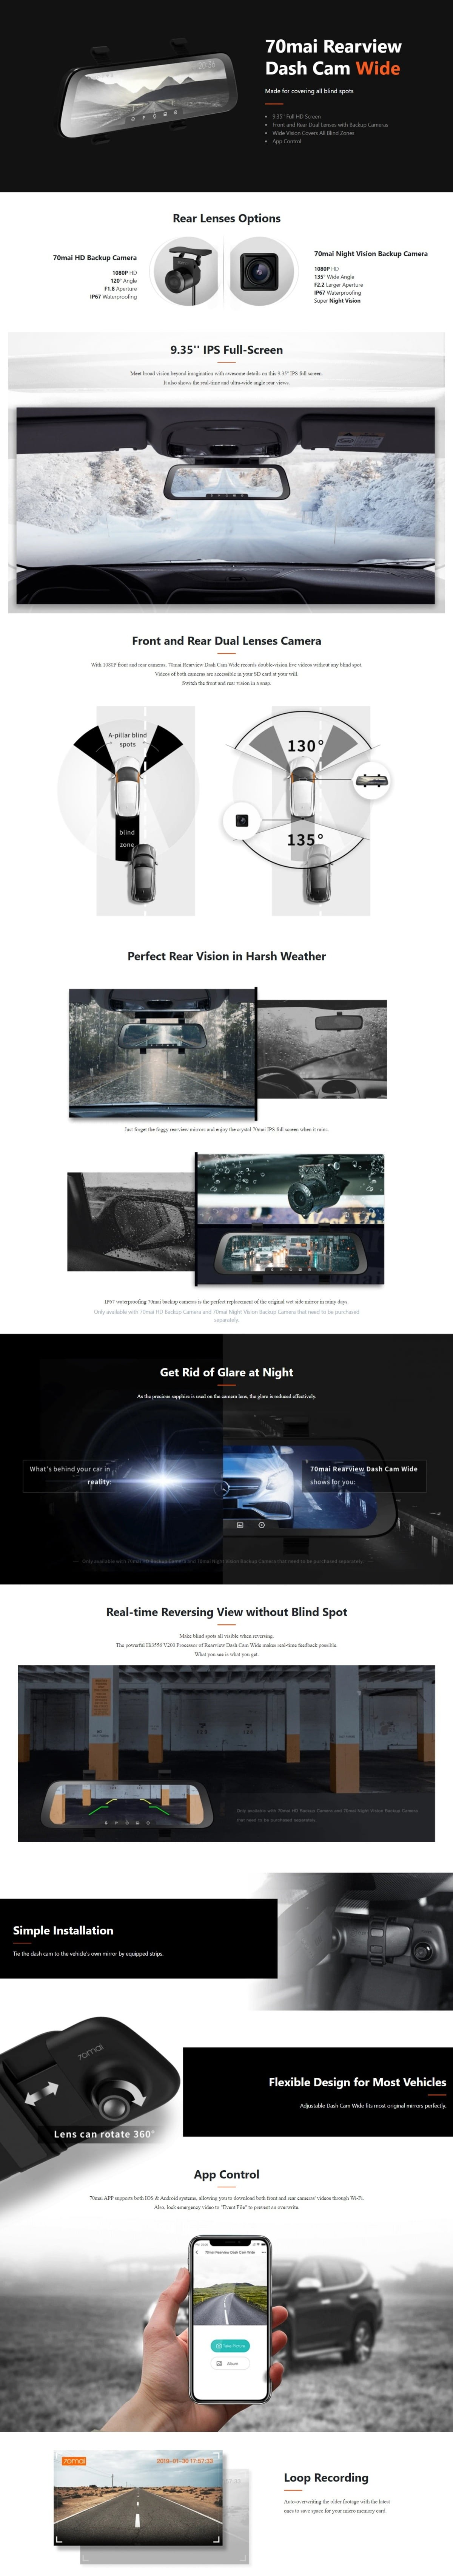 Prezentare-70MAI-Rearview-Dash-Cam-Wide573d1e41507b9379.jpg